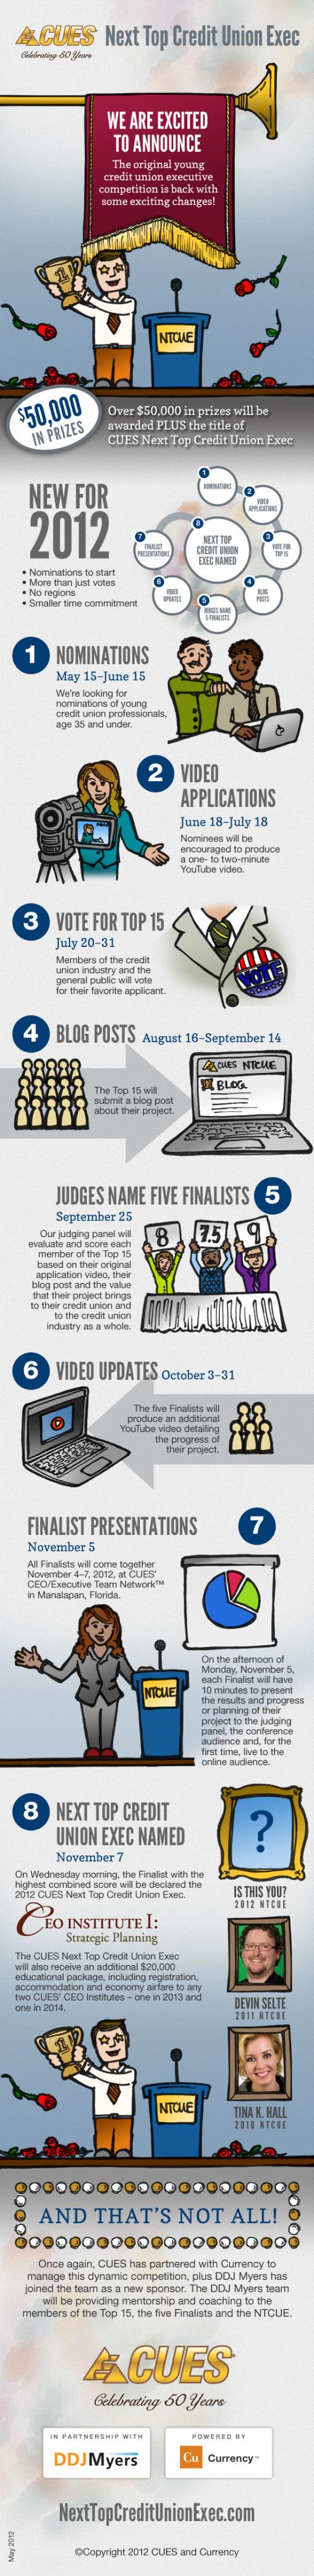 ntcue-2012-infographic.jpg